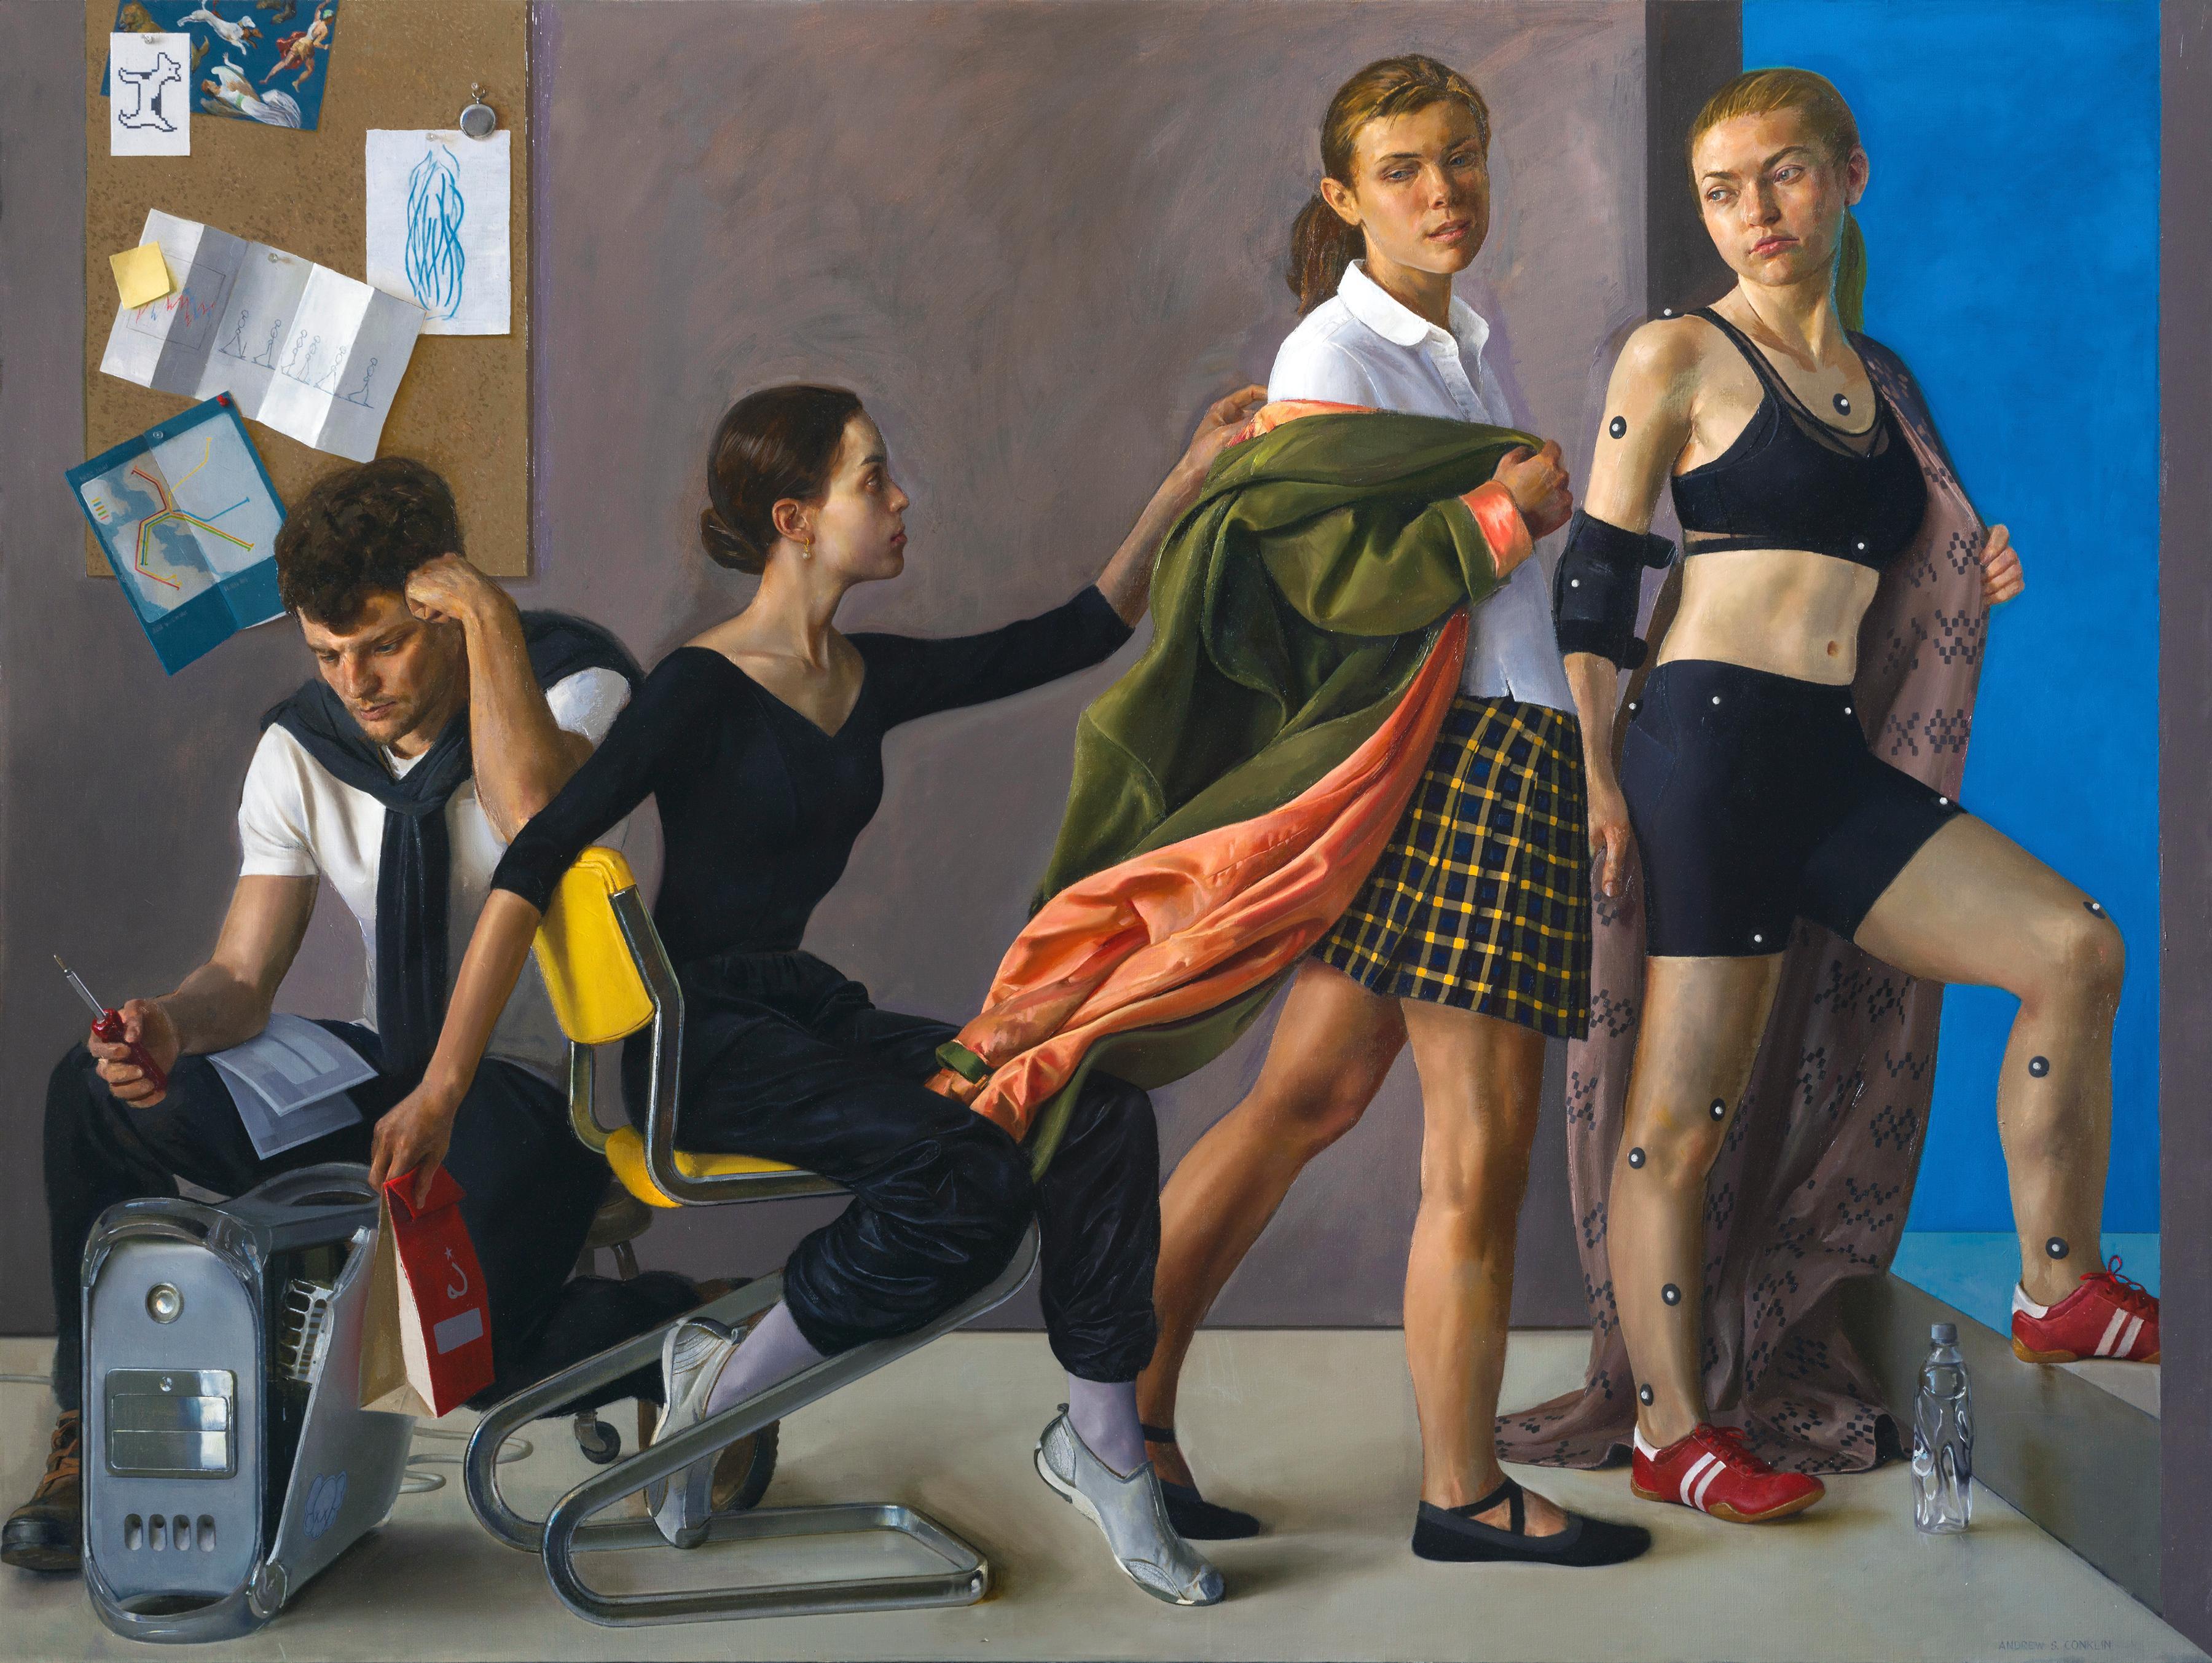 Motion Capture Studio 7 - Original Oil on Linen Painting with Multiple Figures